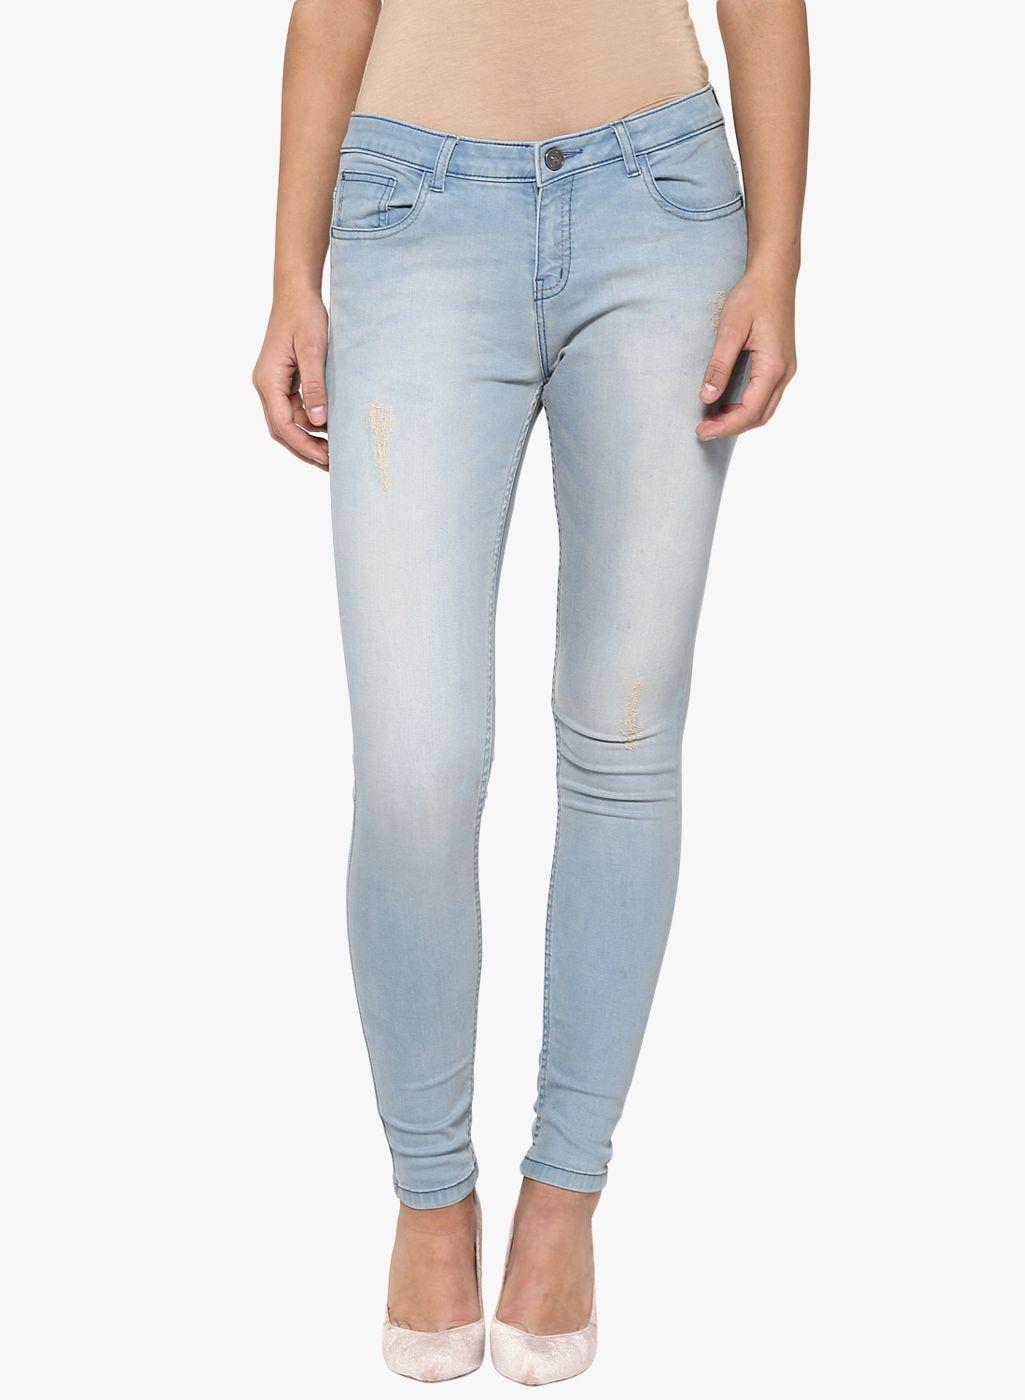 Crimsoune Club Denim Jeans - Blue